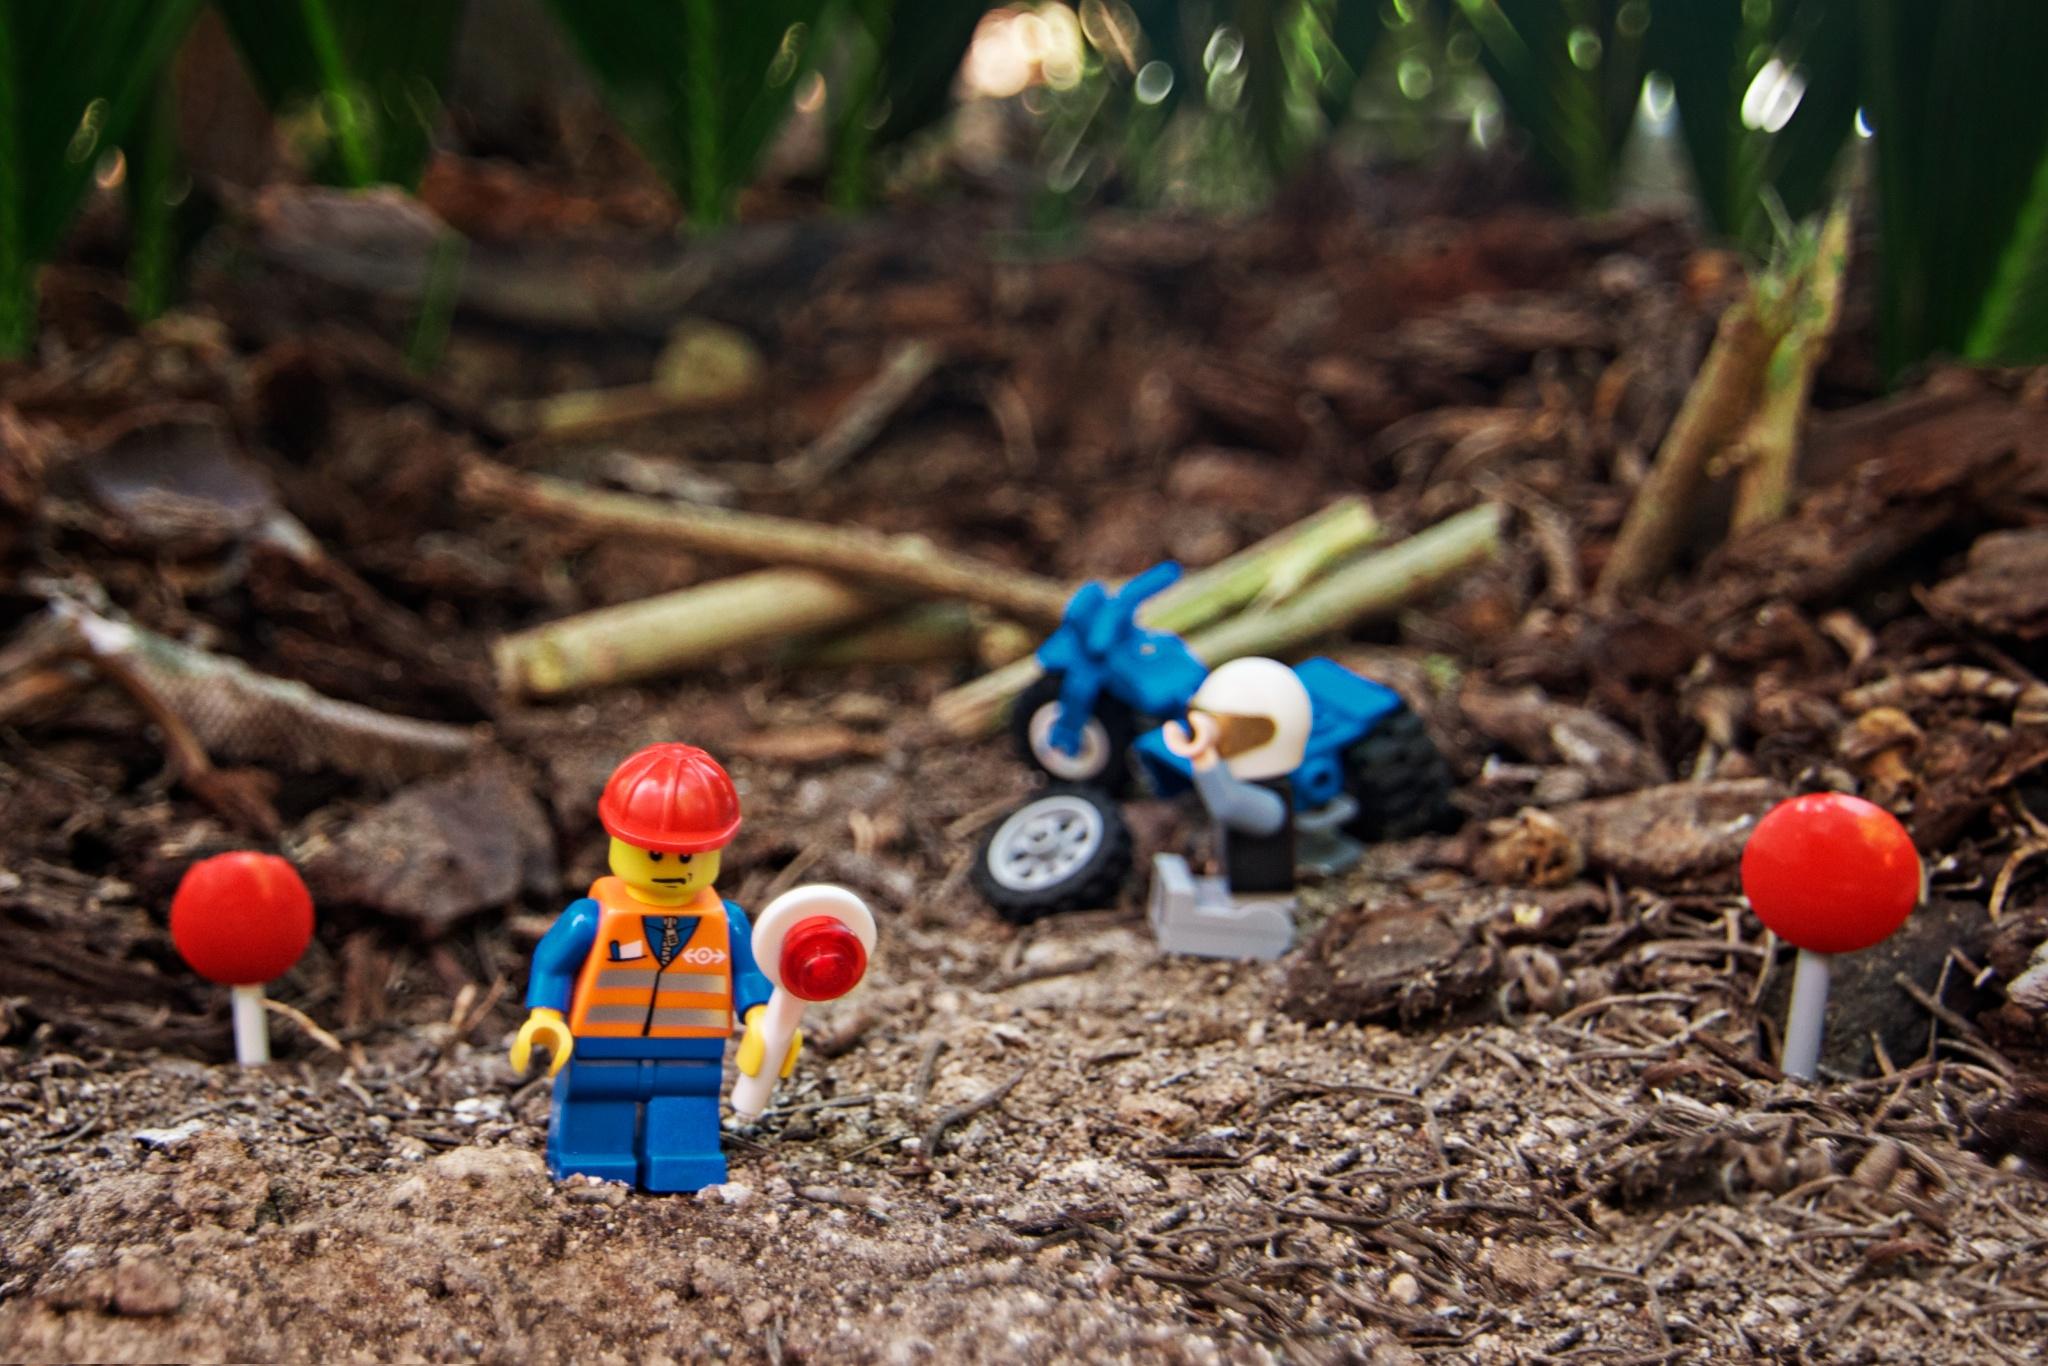 Lego Man / Roadside Assistance